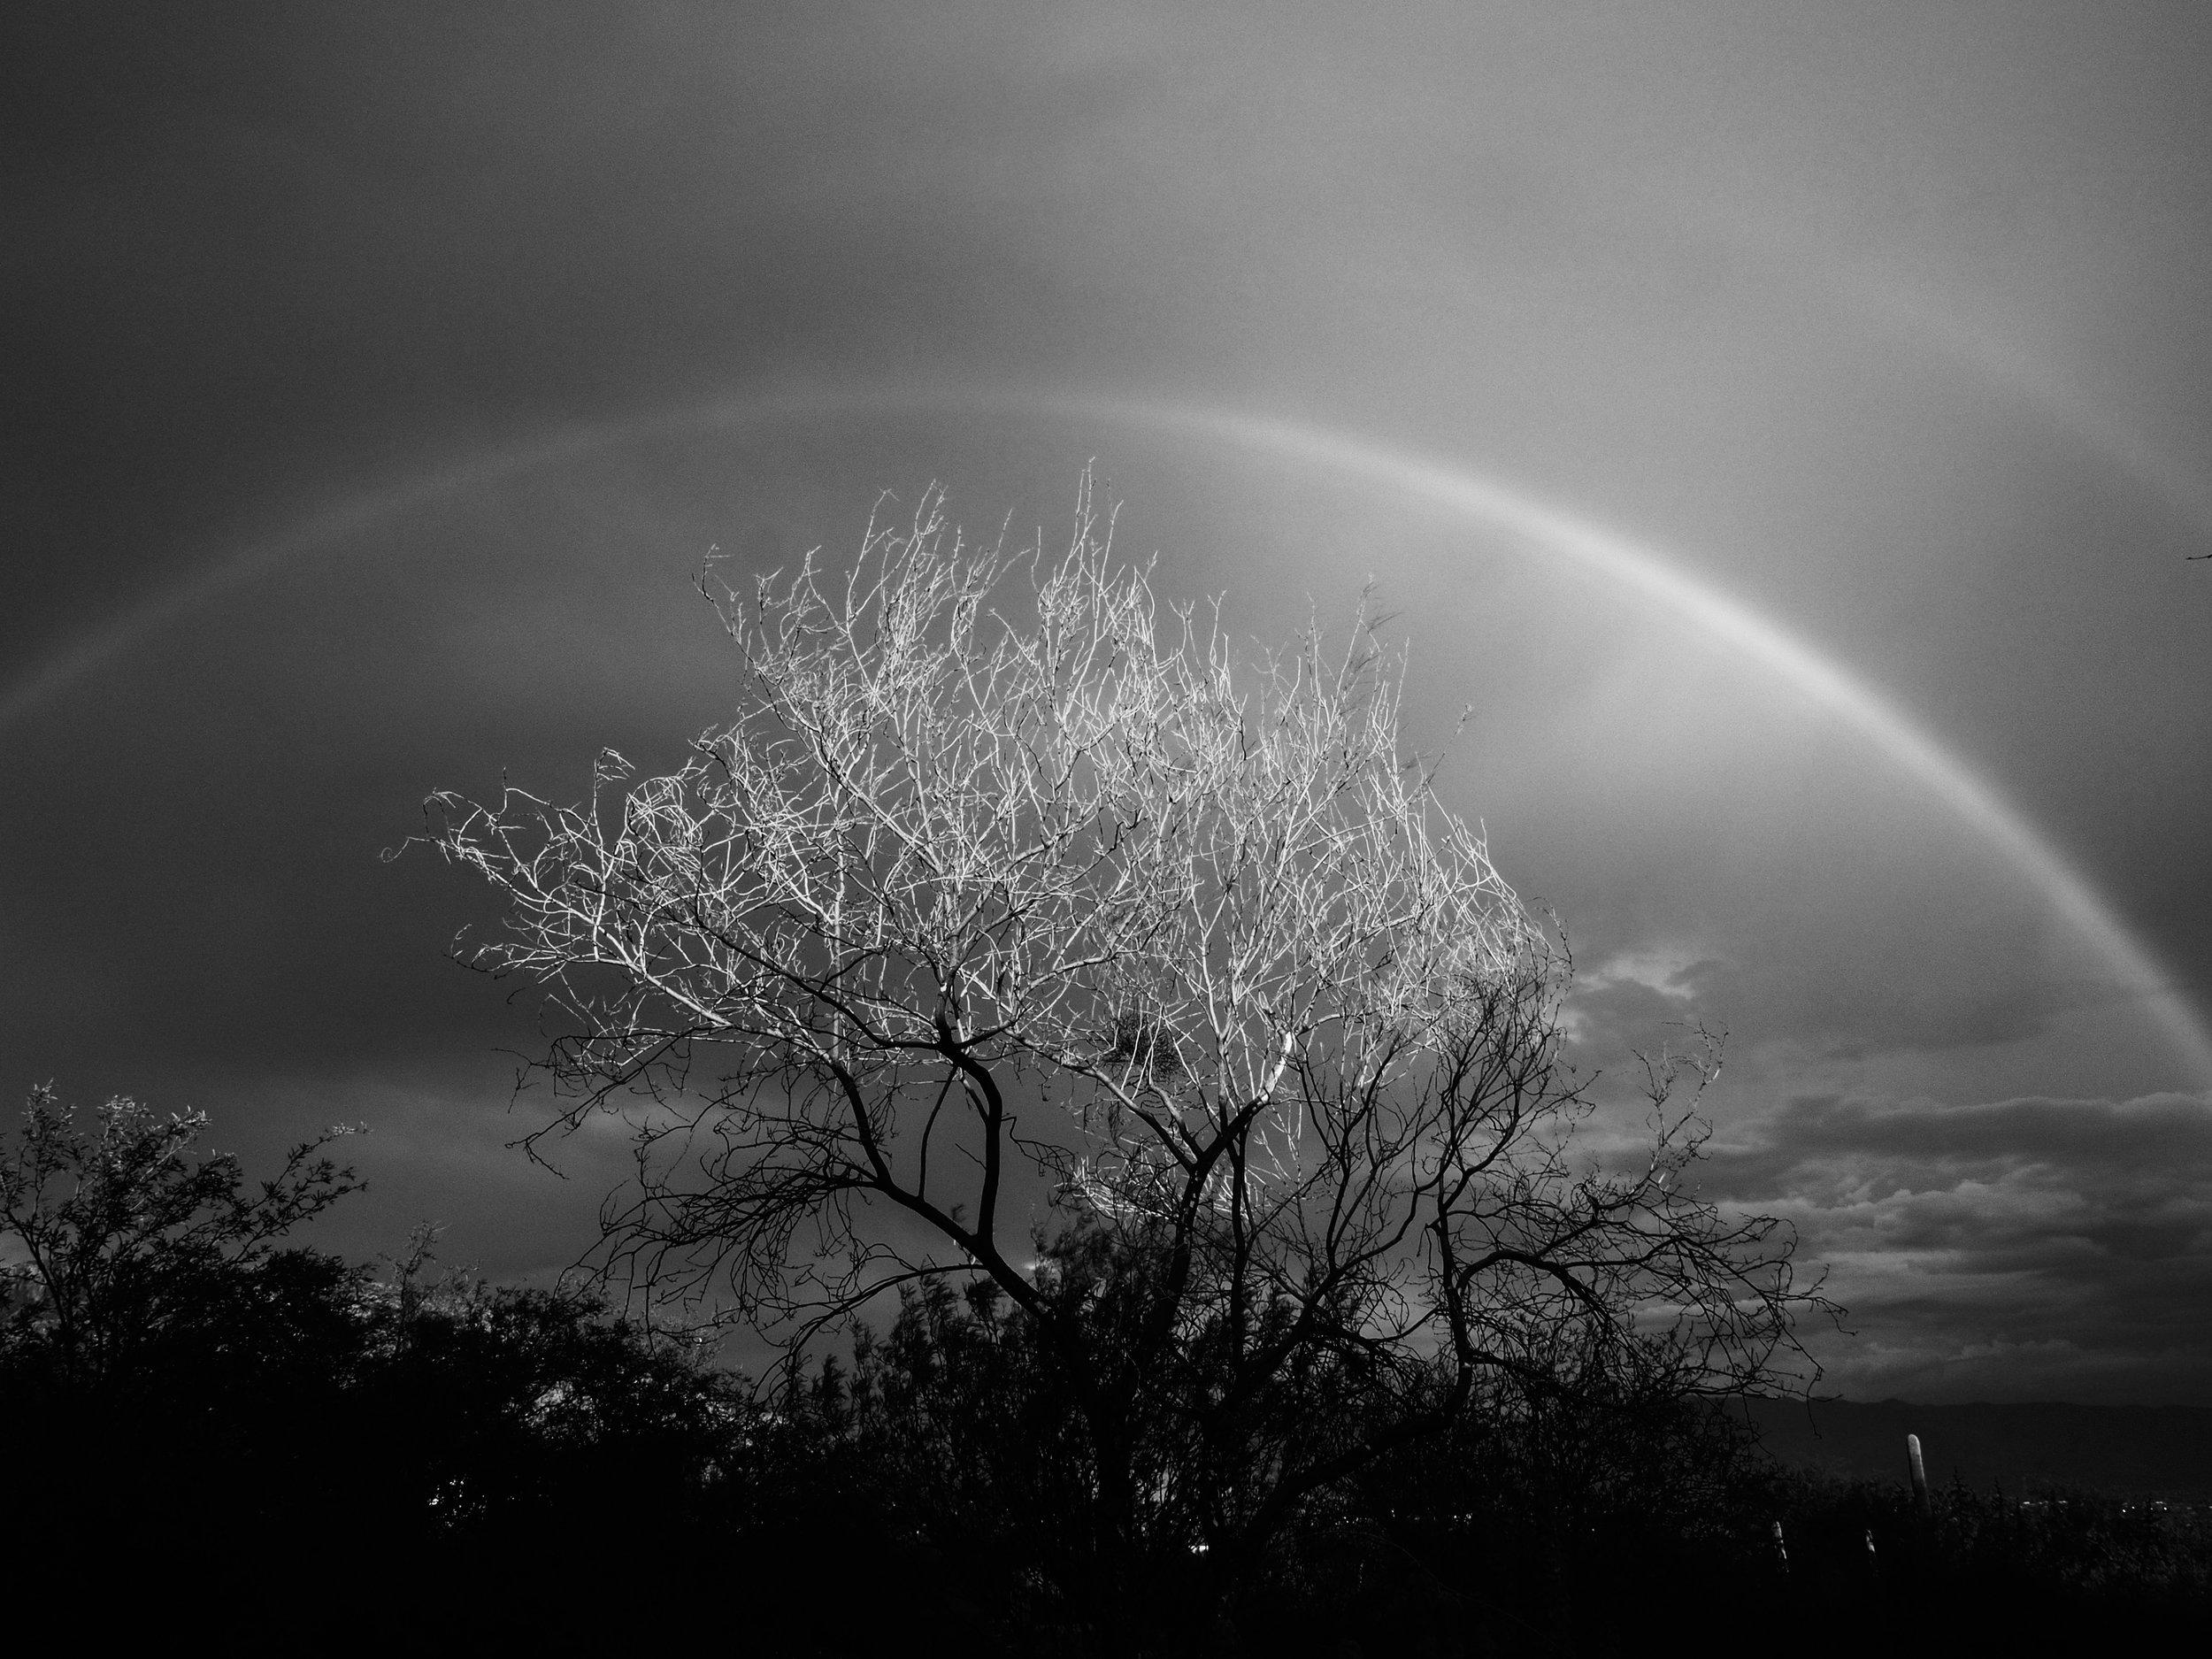 Dead Tree with Rainbow